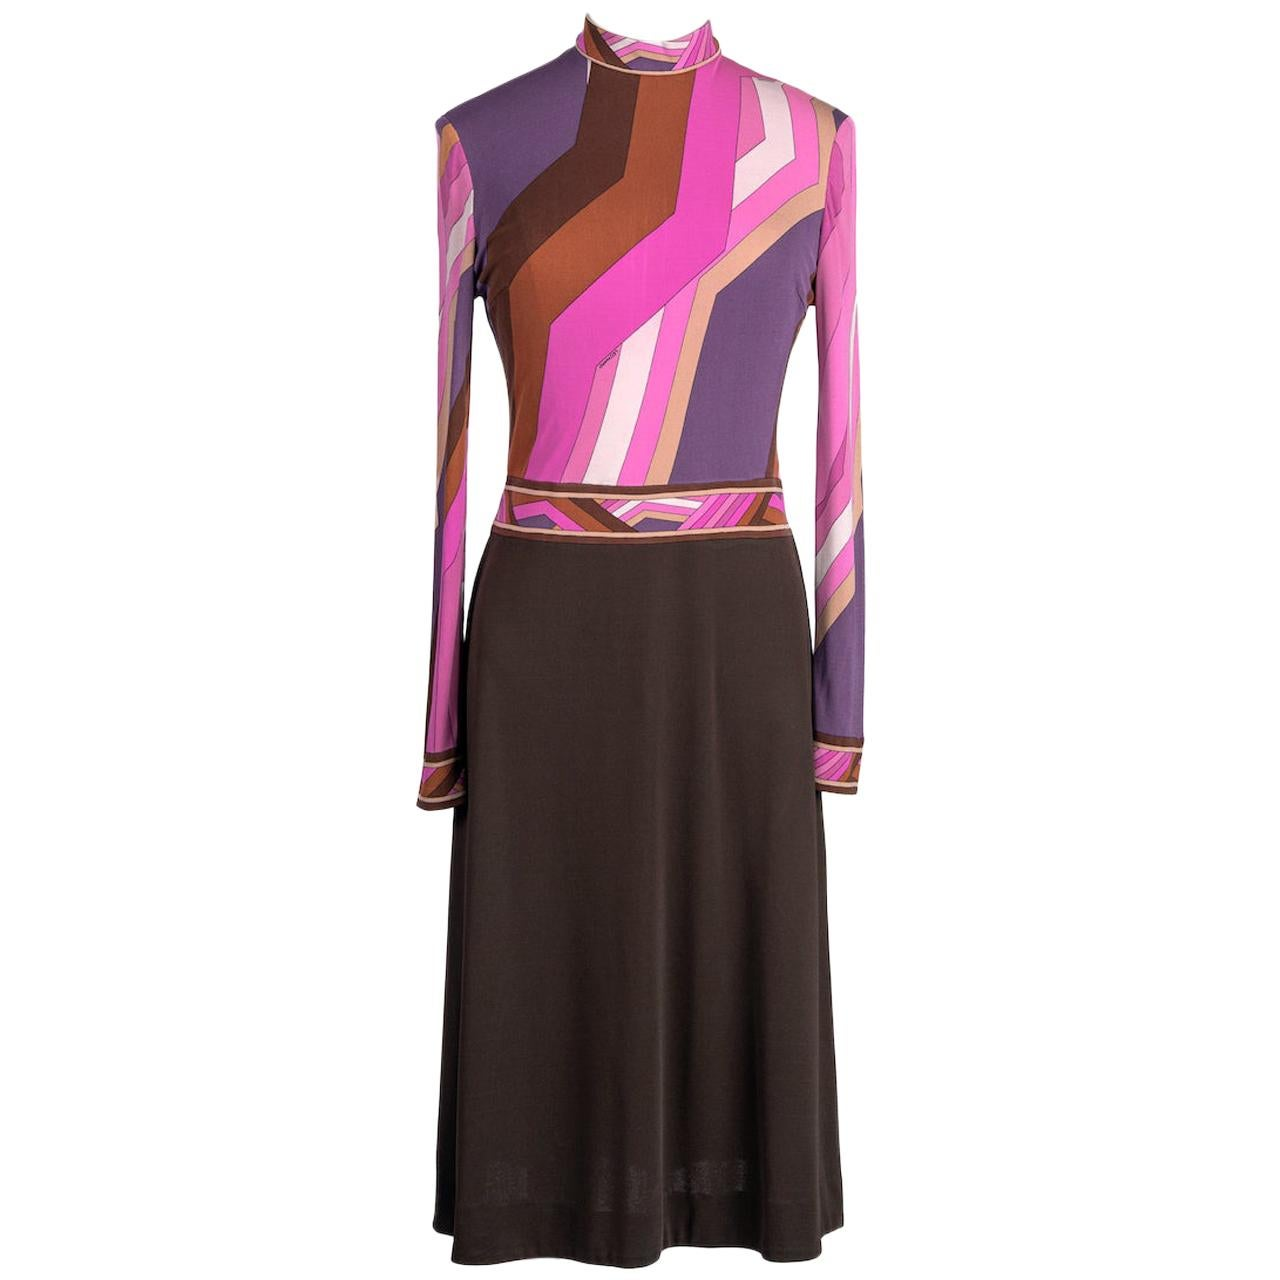 LEONARD Fashion Paris Pink Purple Brown Geometric Print Silk Jersey Dress, 1970s